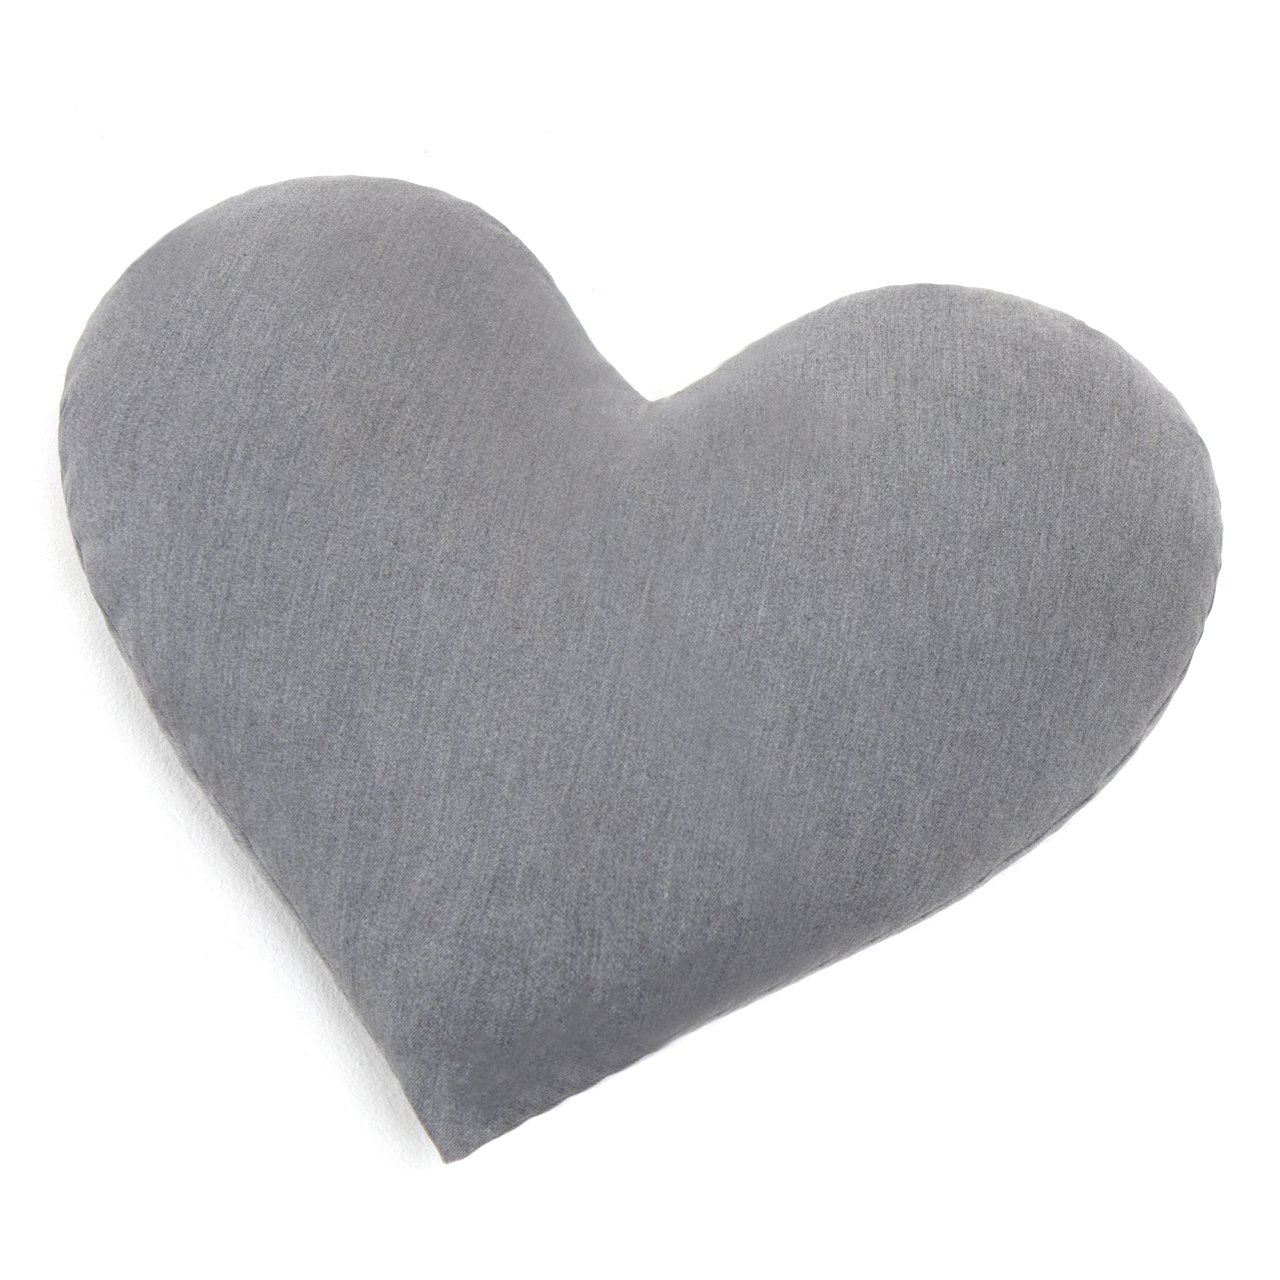 Toy Heart one size hellgrau